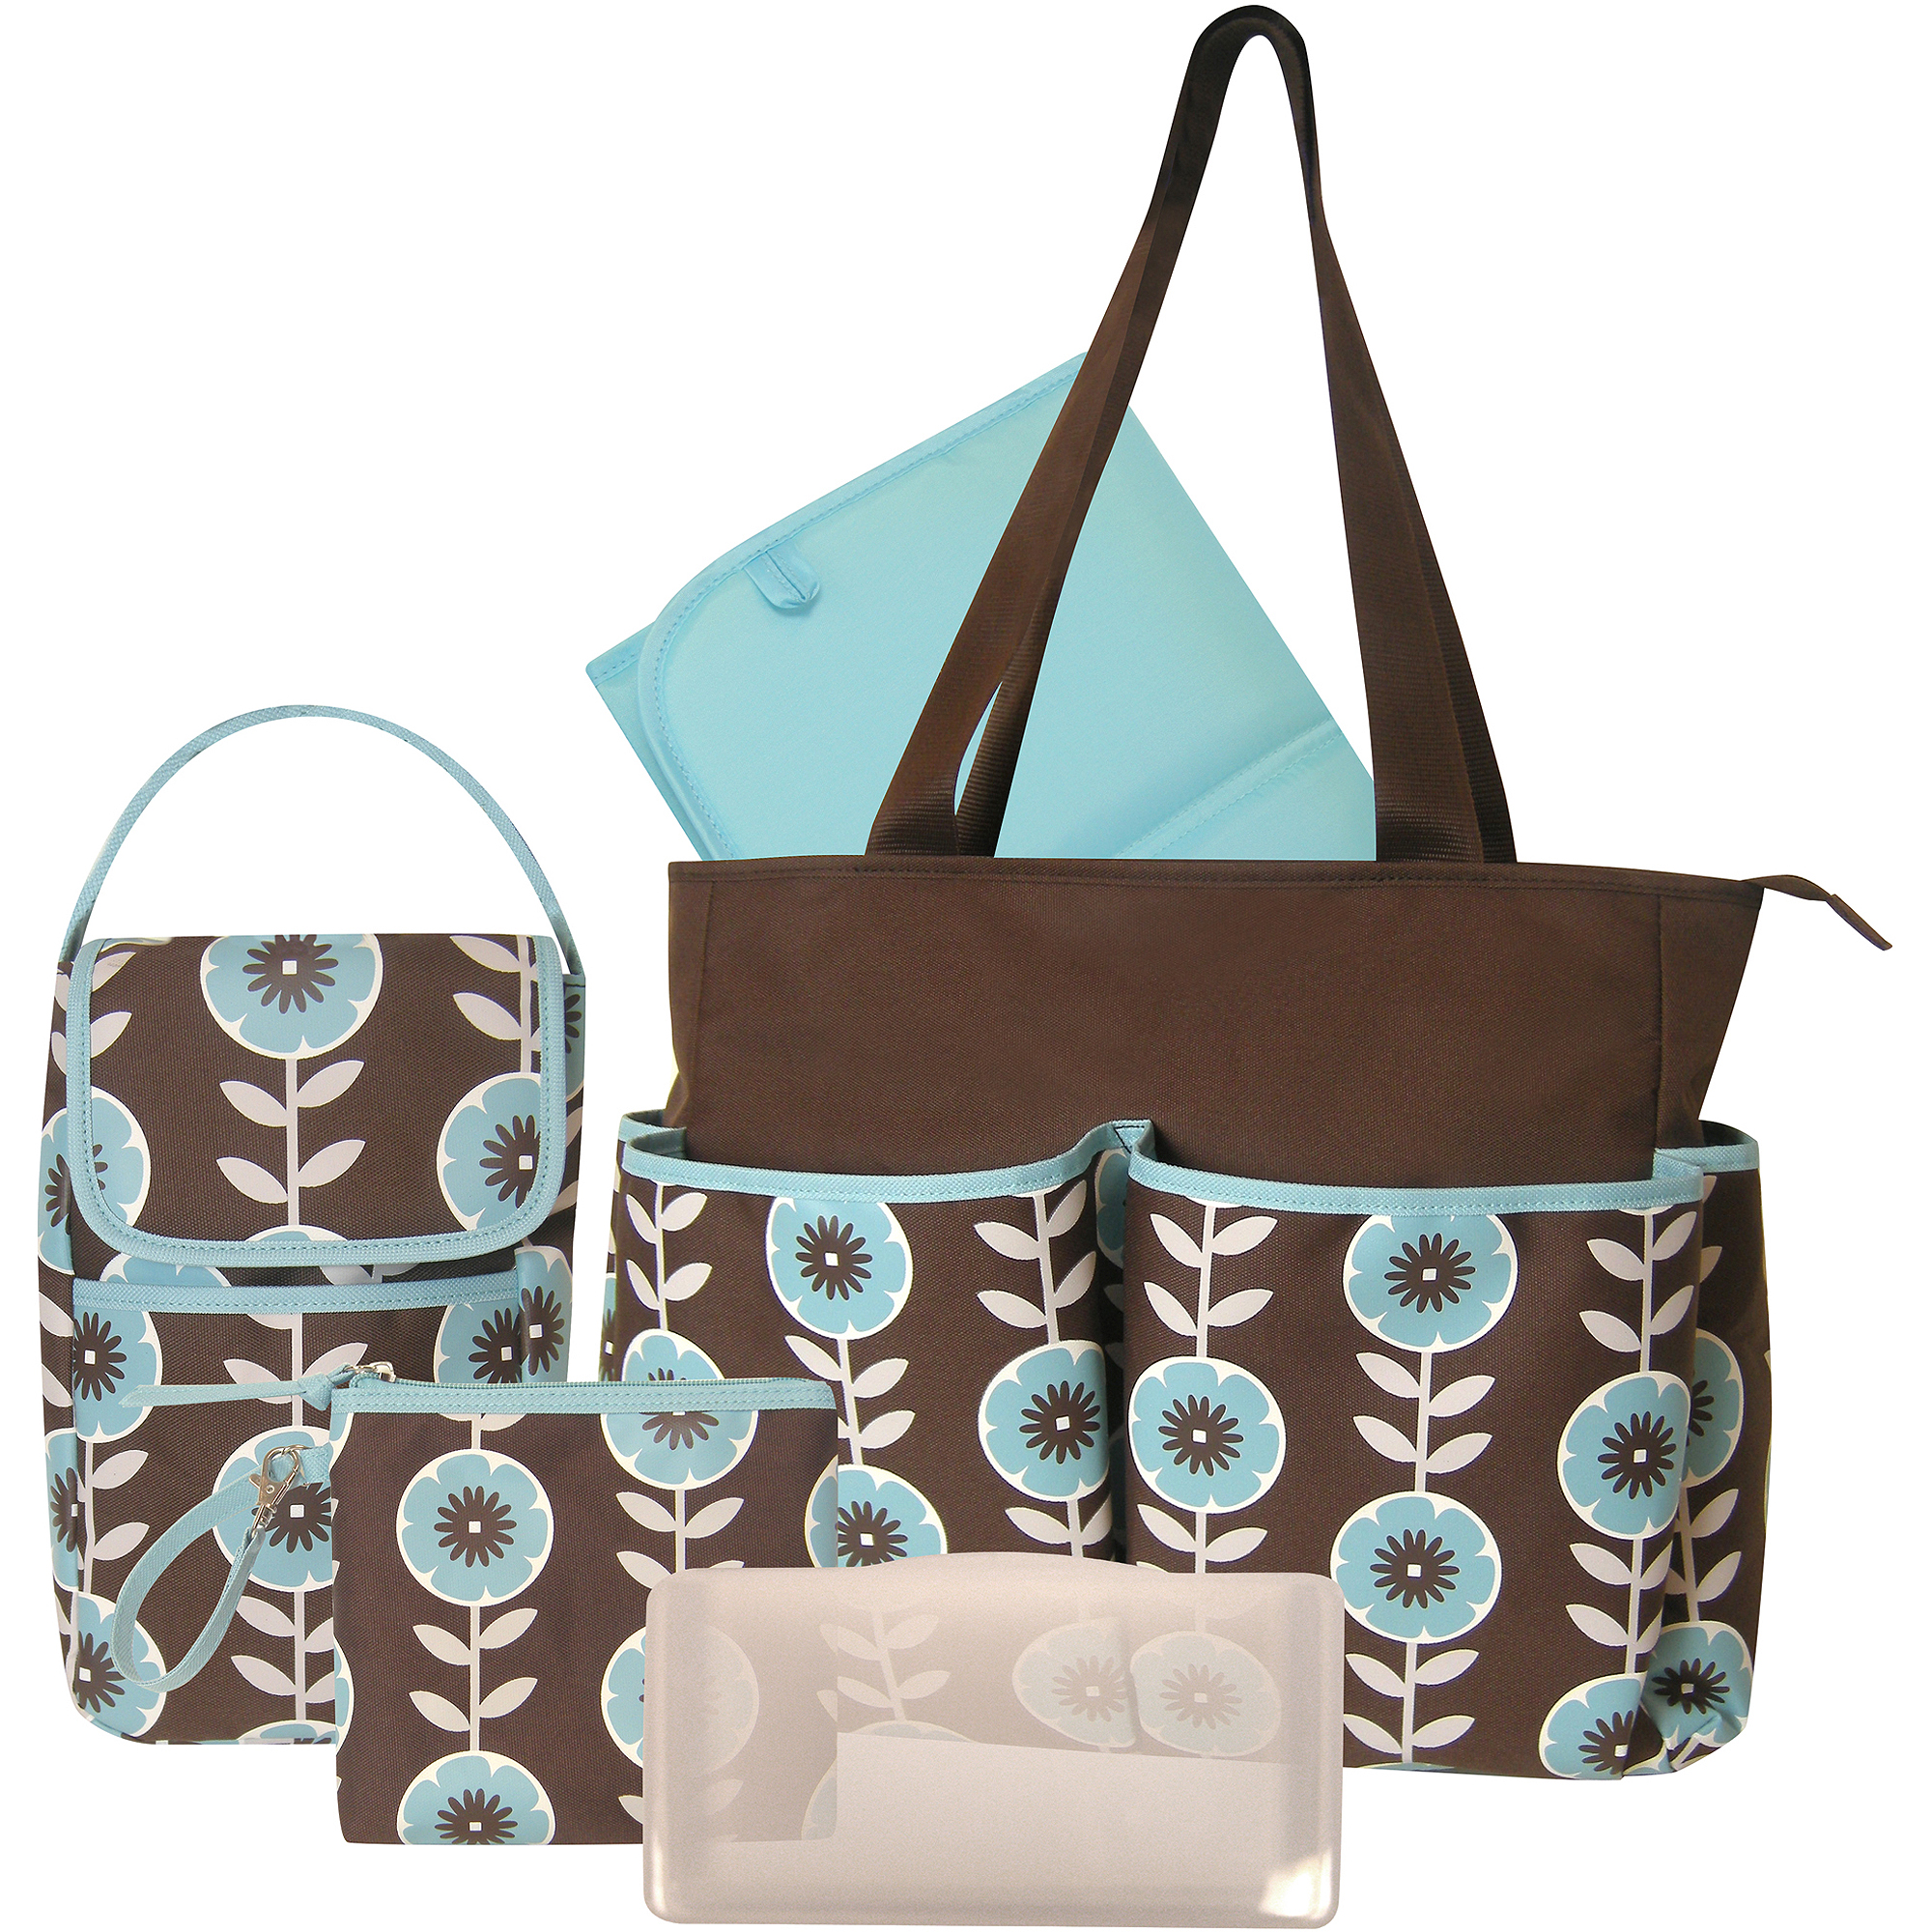 Baby Essentials Floral 3 Piece Diaper Bag Set with Bonus Bottle Bag